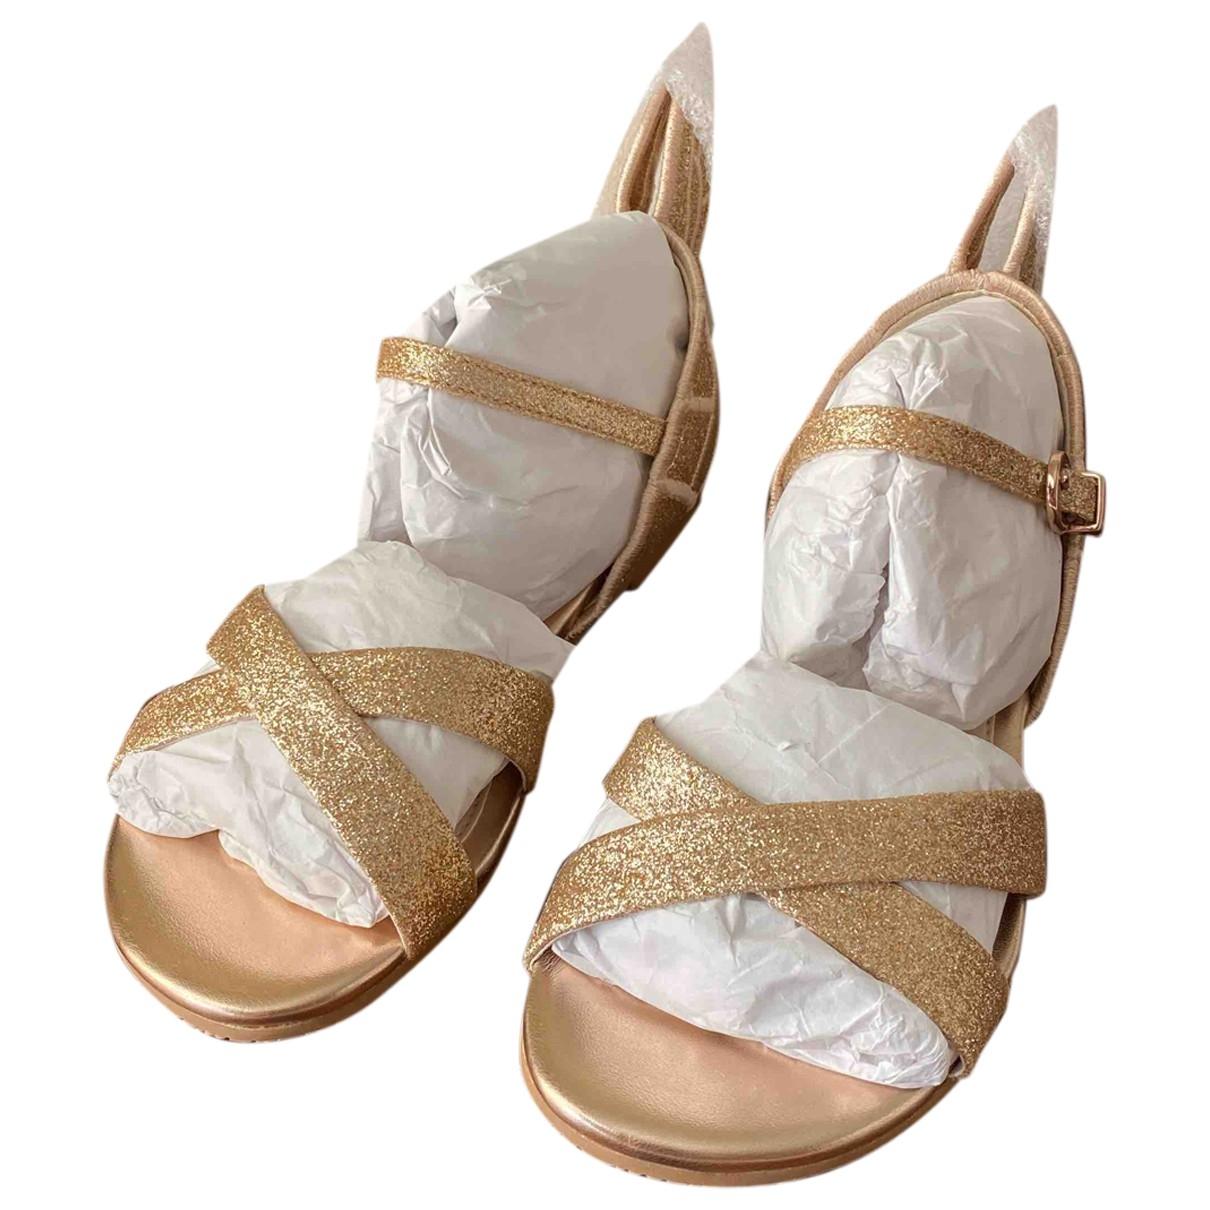 Sandalias de Con lentejuelas Sophia Webster